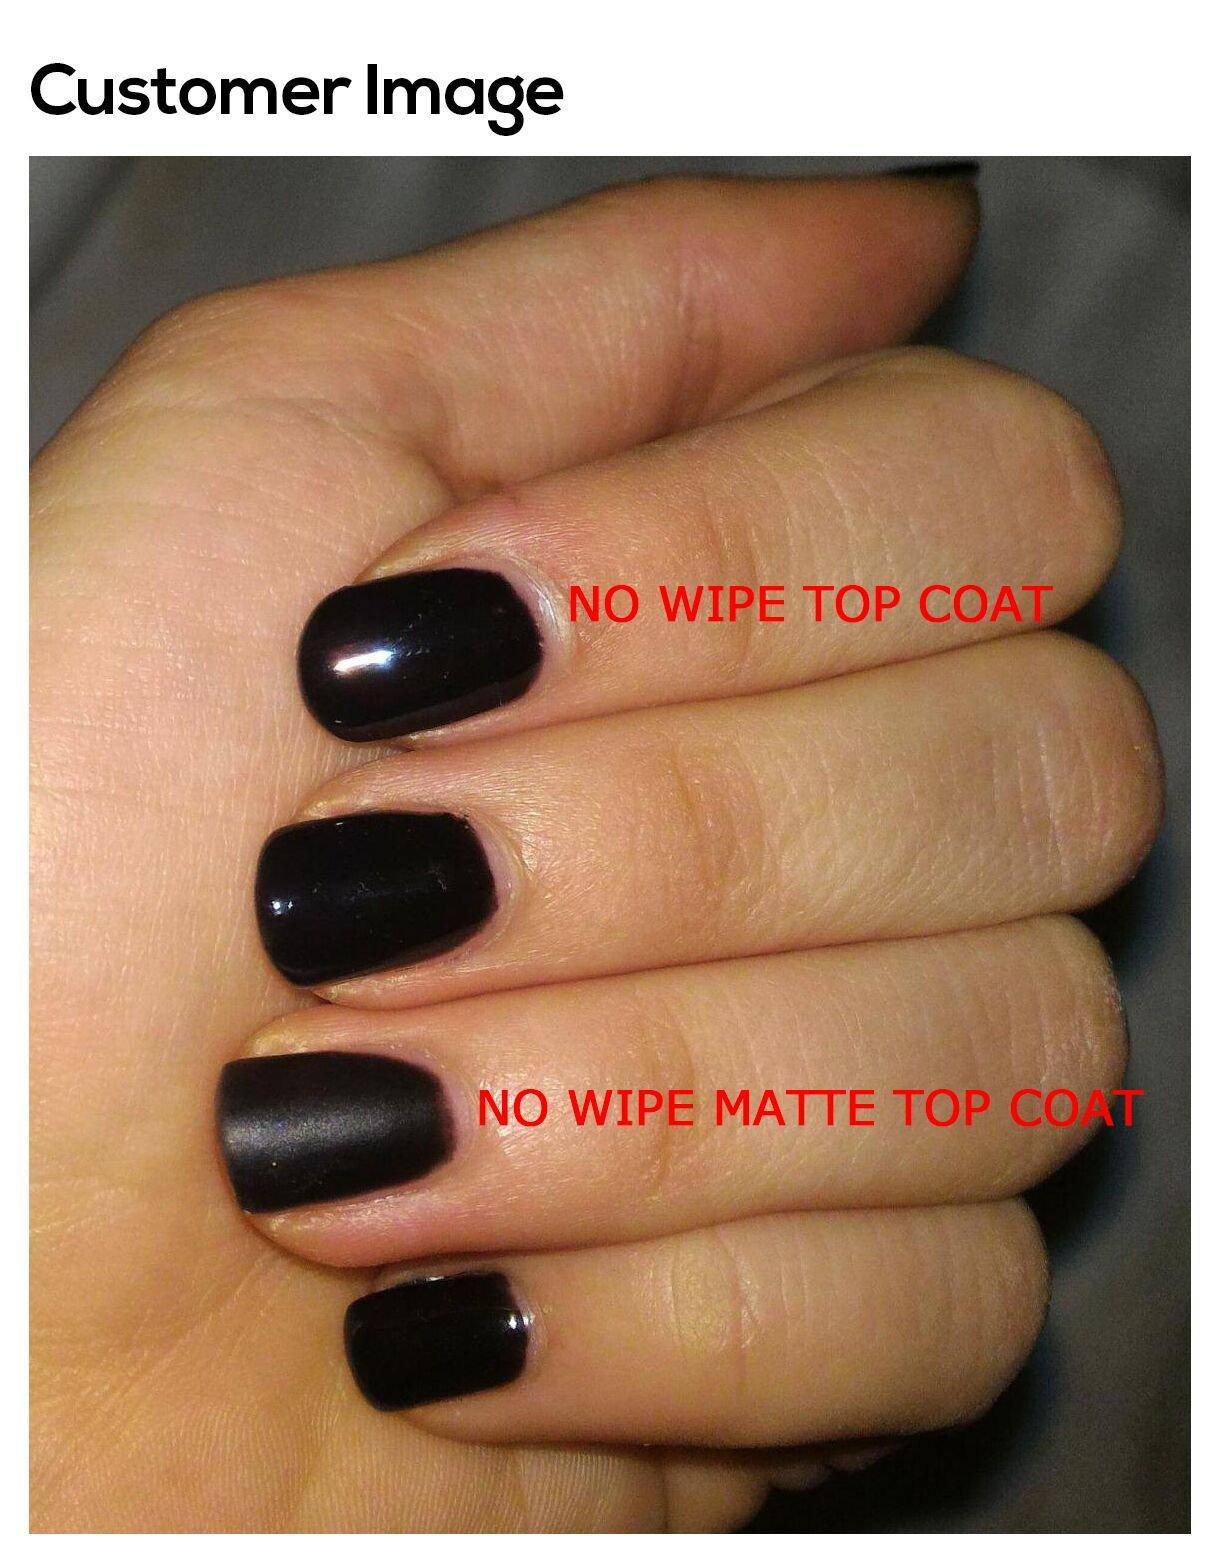 AIMEILI Top Coat Mate Esmalte Semipermanente De Uñas Soak Off UV LED Uñas De Gel – No Wipe Matte Capa Superior 10ml